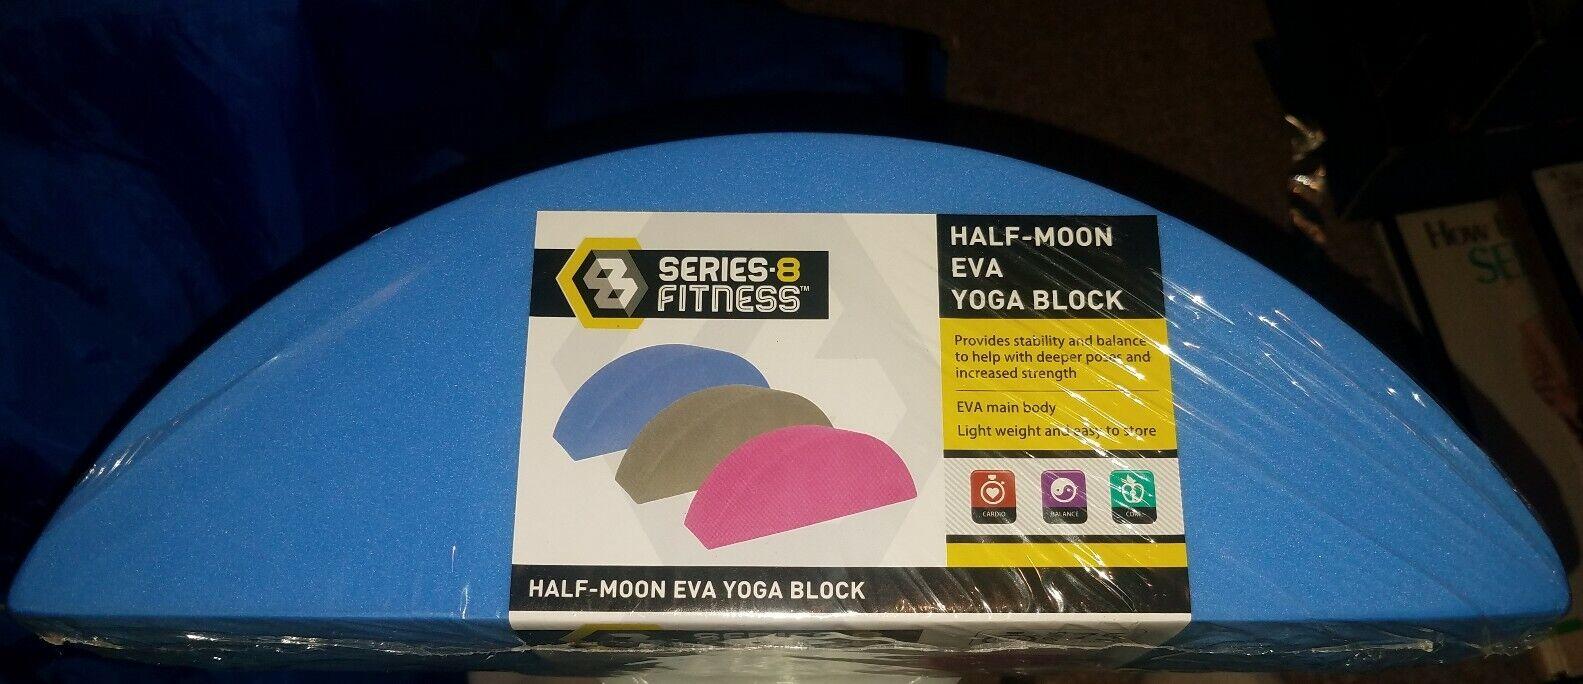 Series – 8 Fitness Blue Half-Moon 'Eva' Yoga Block  [New]